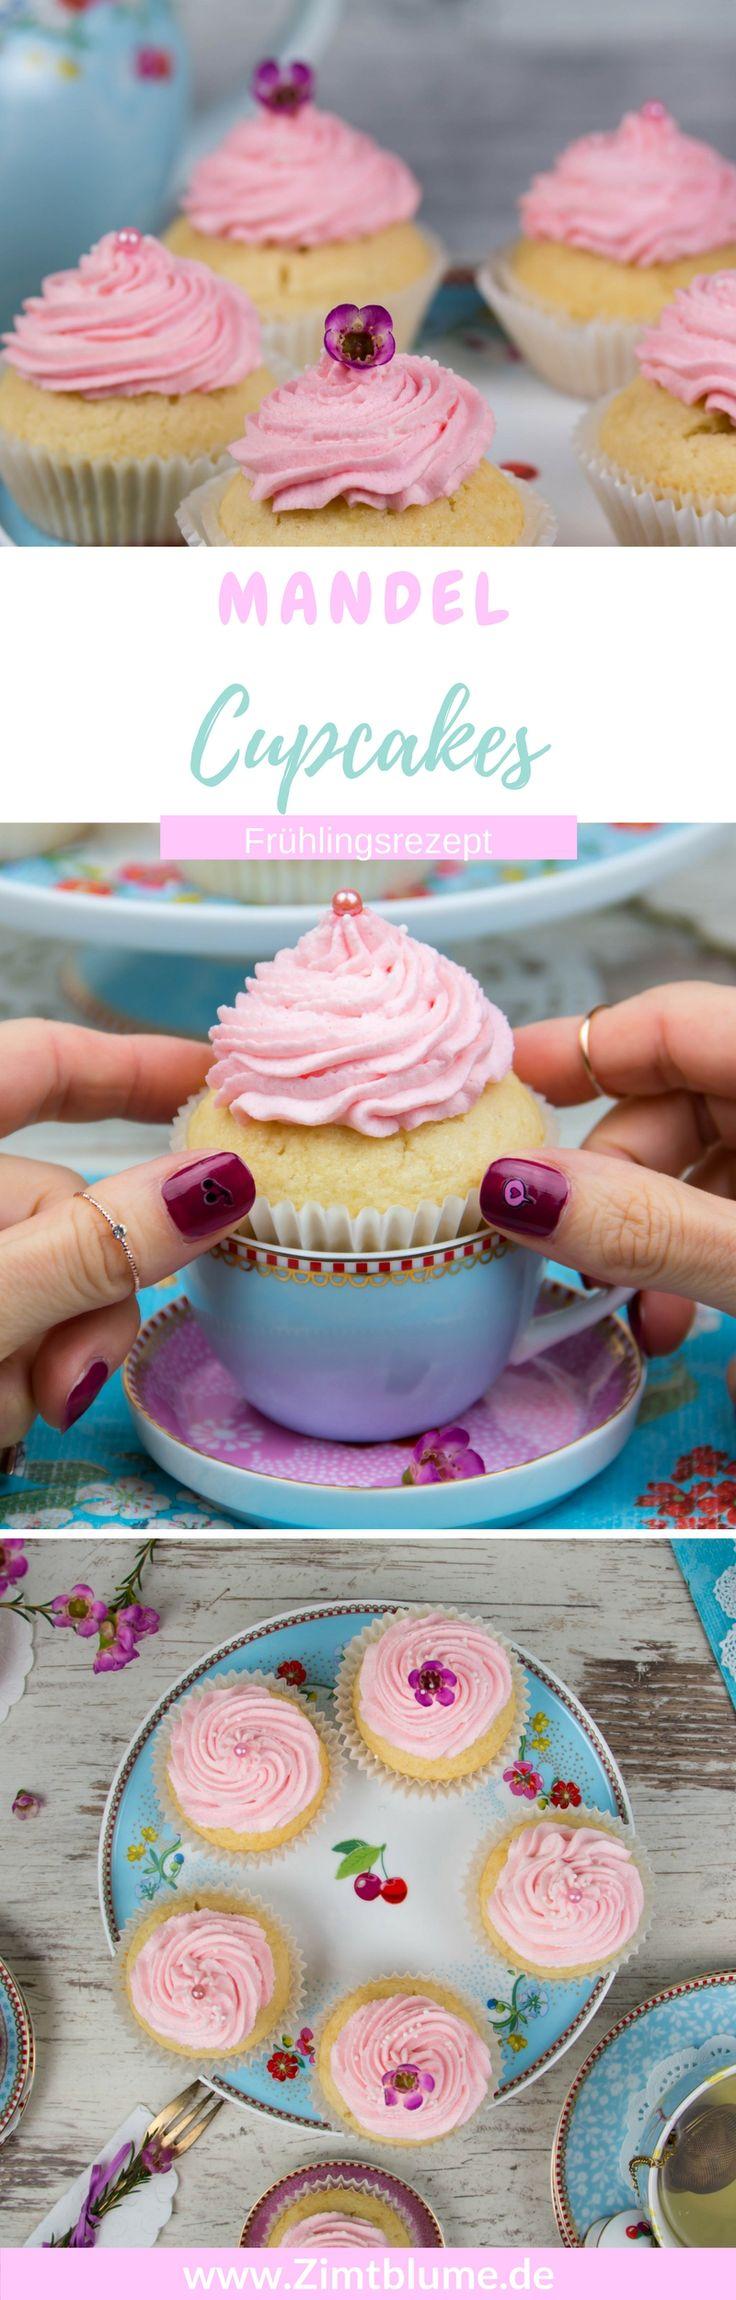 Rezept für rosa Mandel Cupcakes: Frühlingsbeginn mit Pip Studio via @DieZimtblume